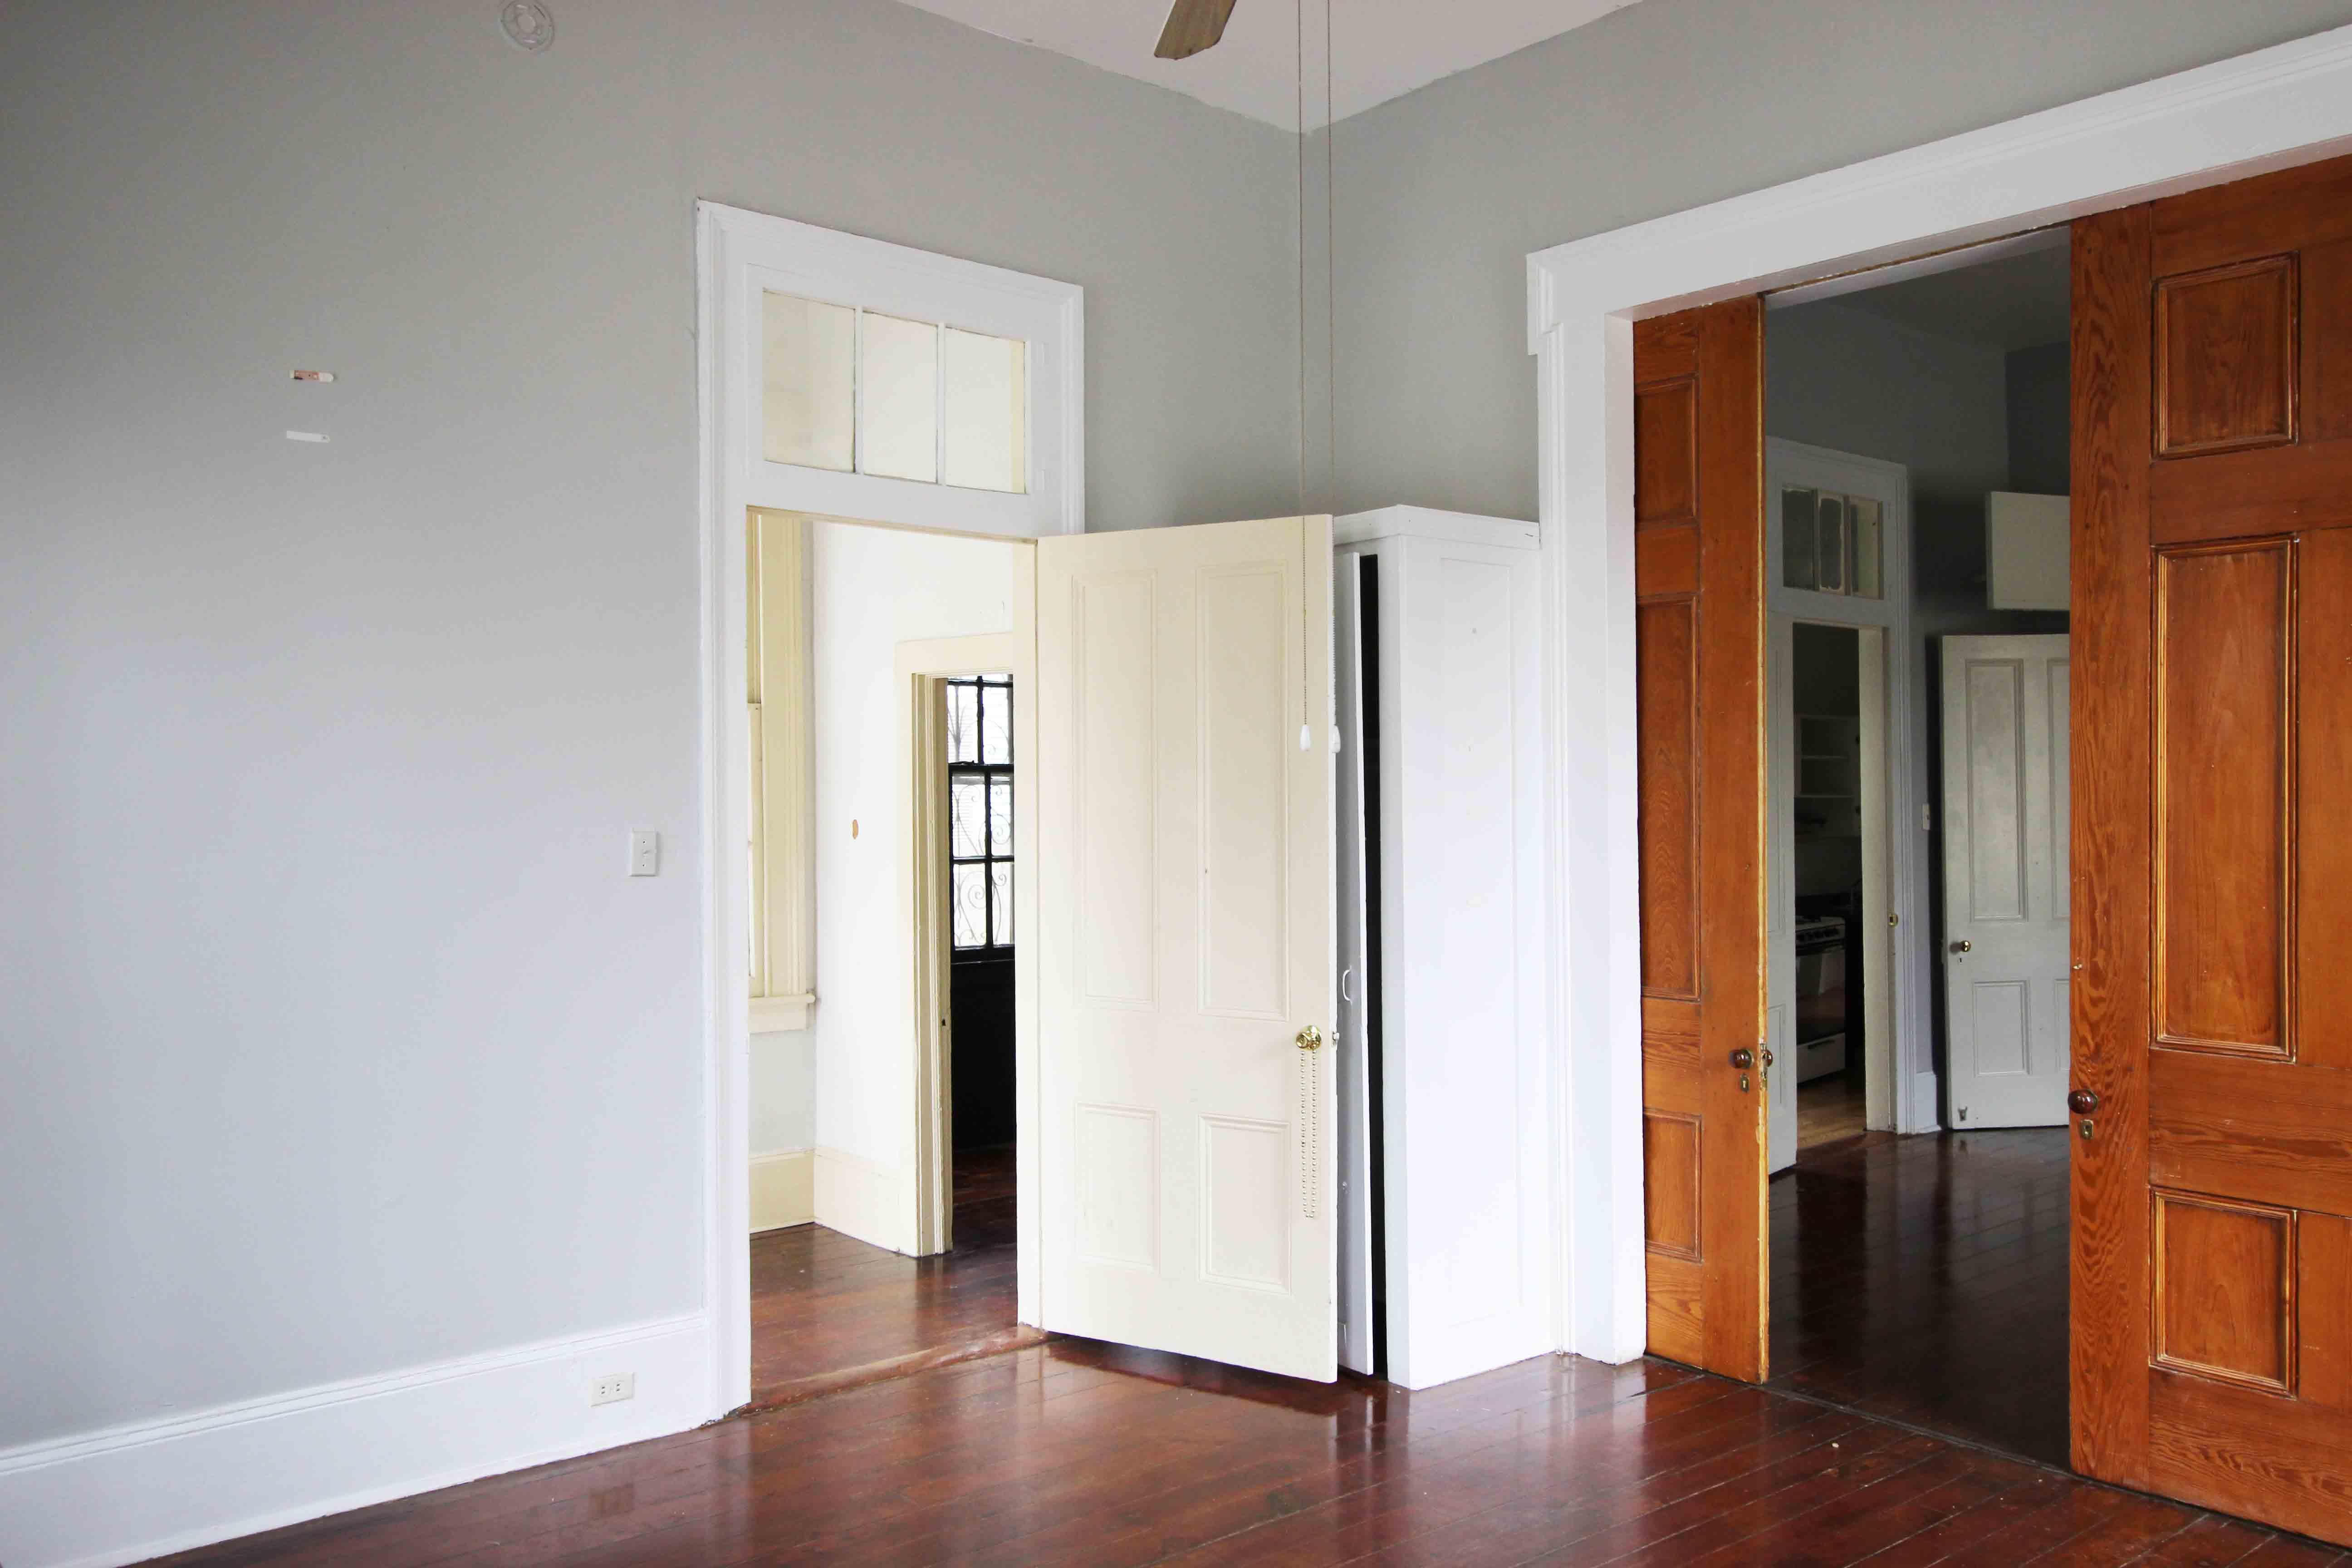 Apartment Rental Management Companies